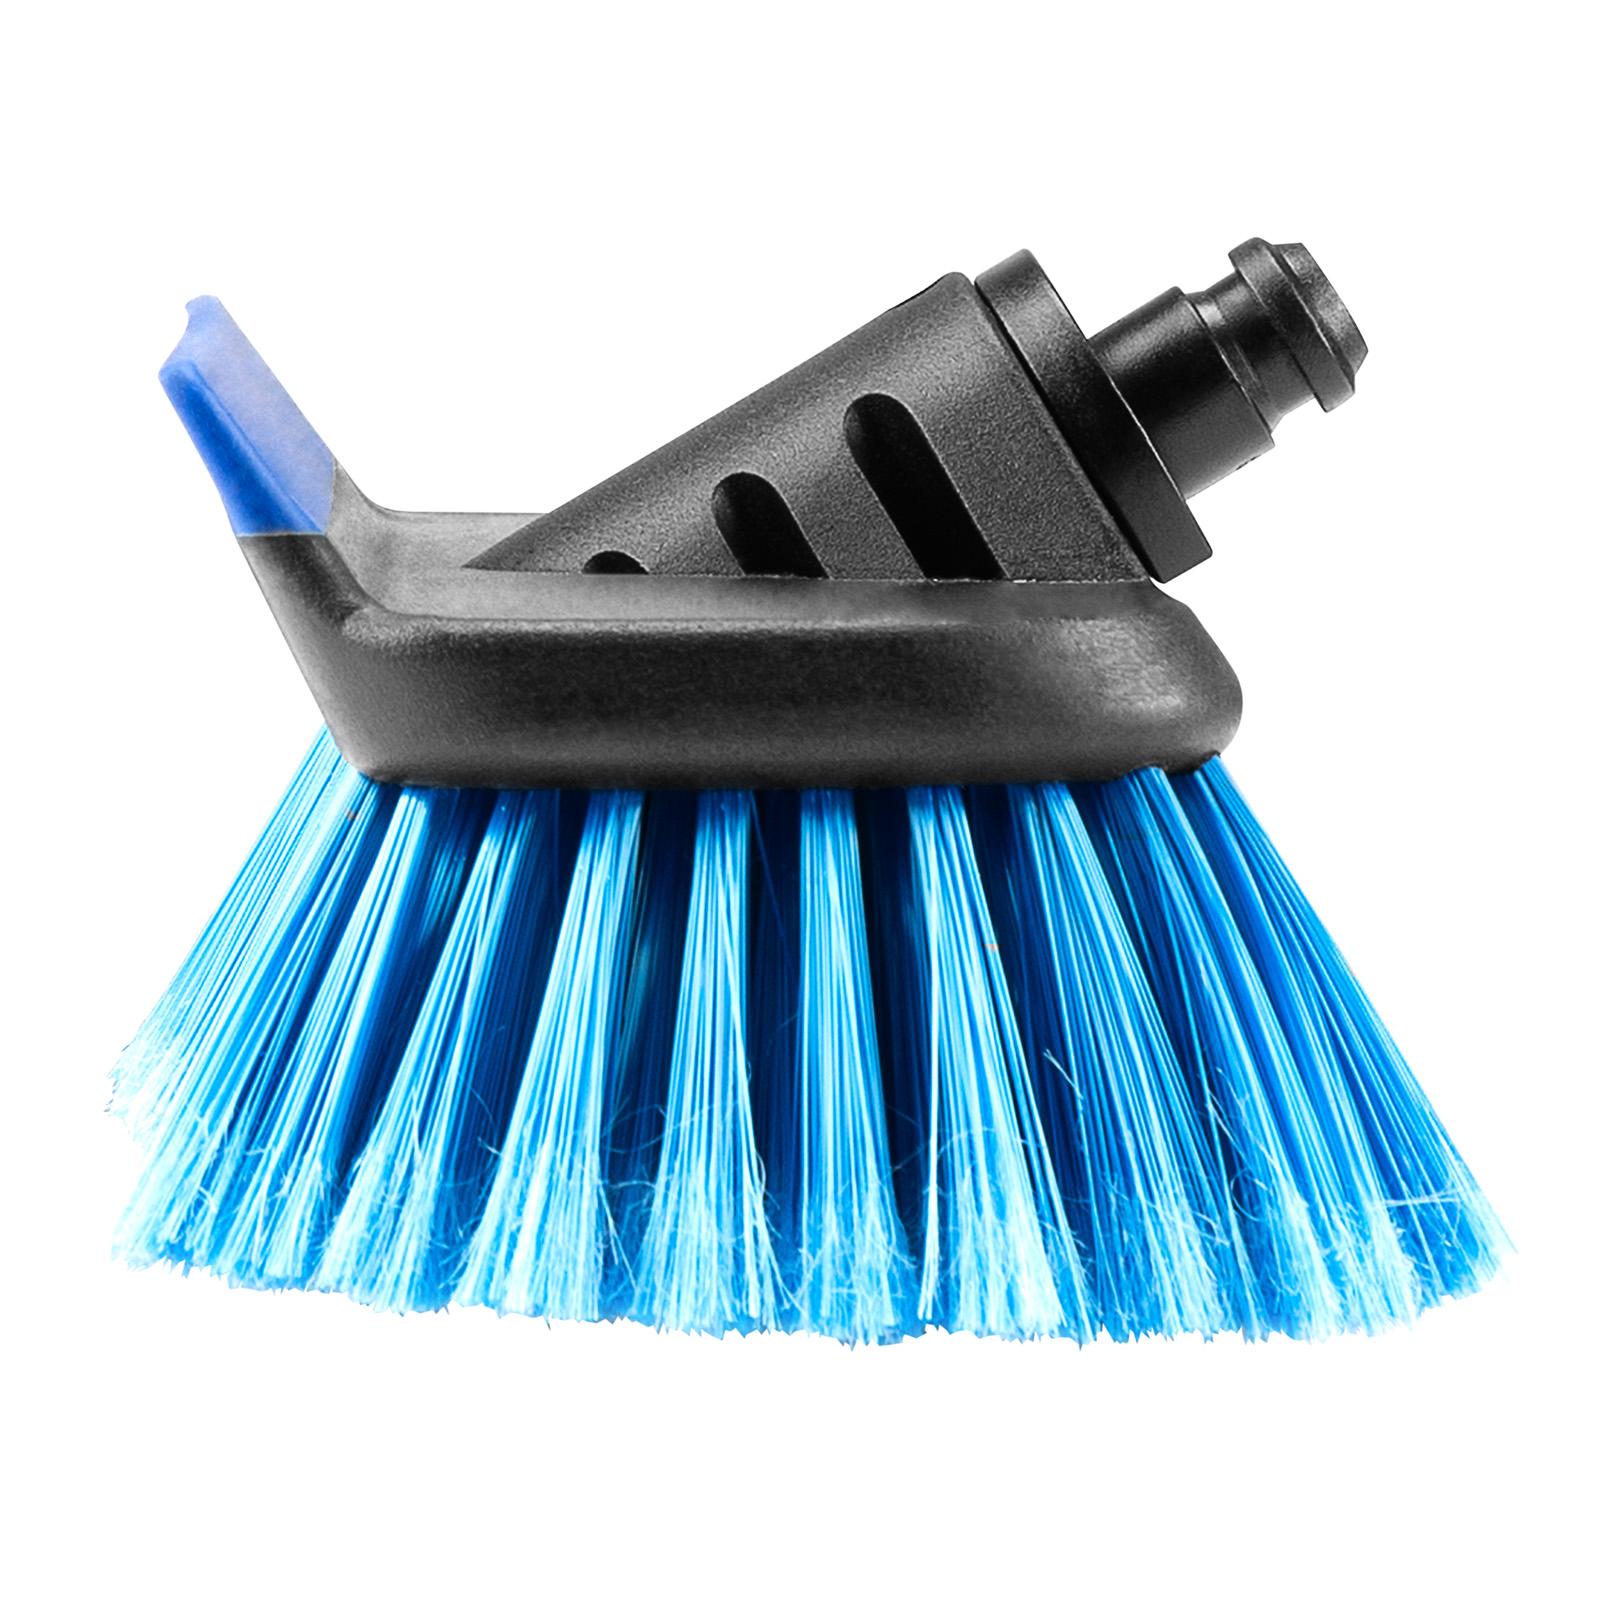 Gerni Auto Brush - Side